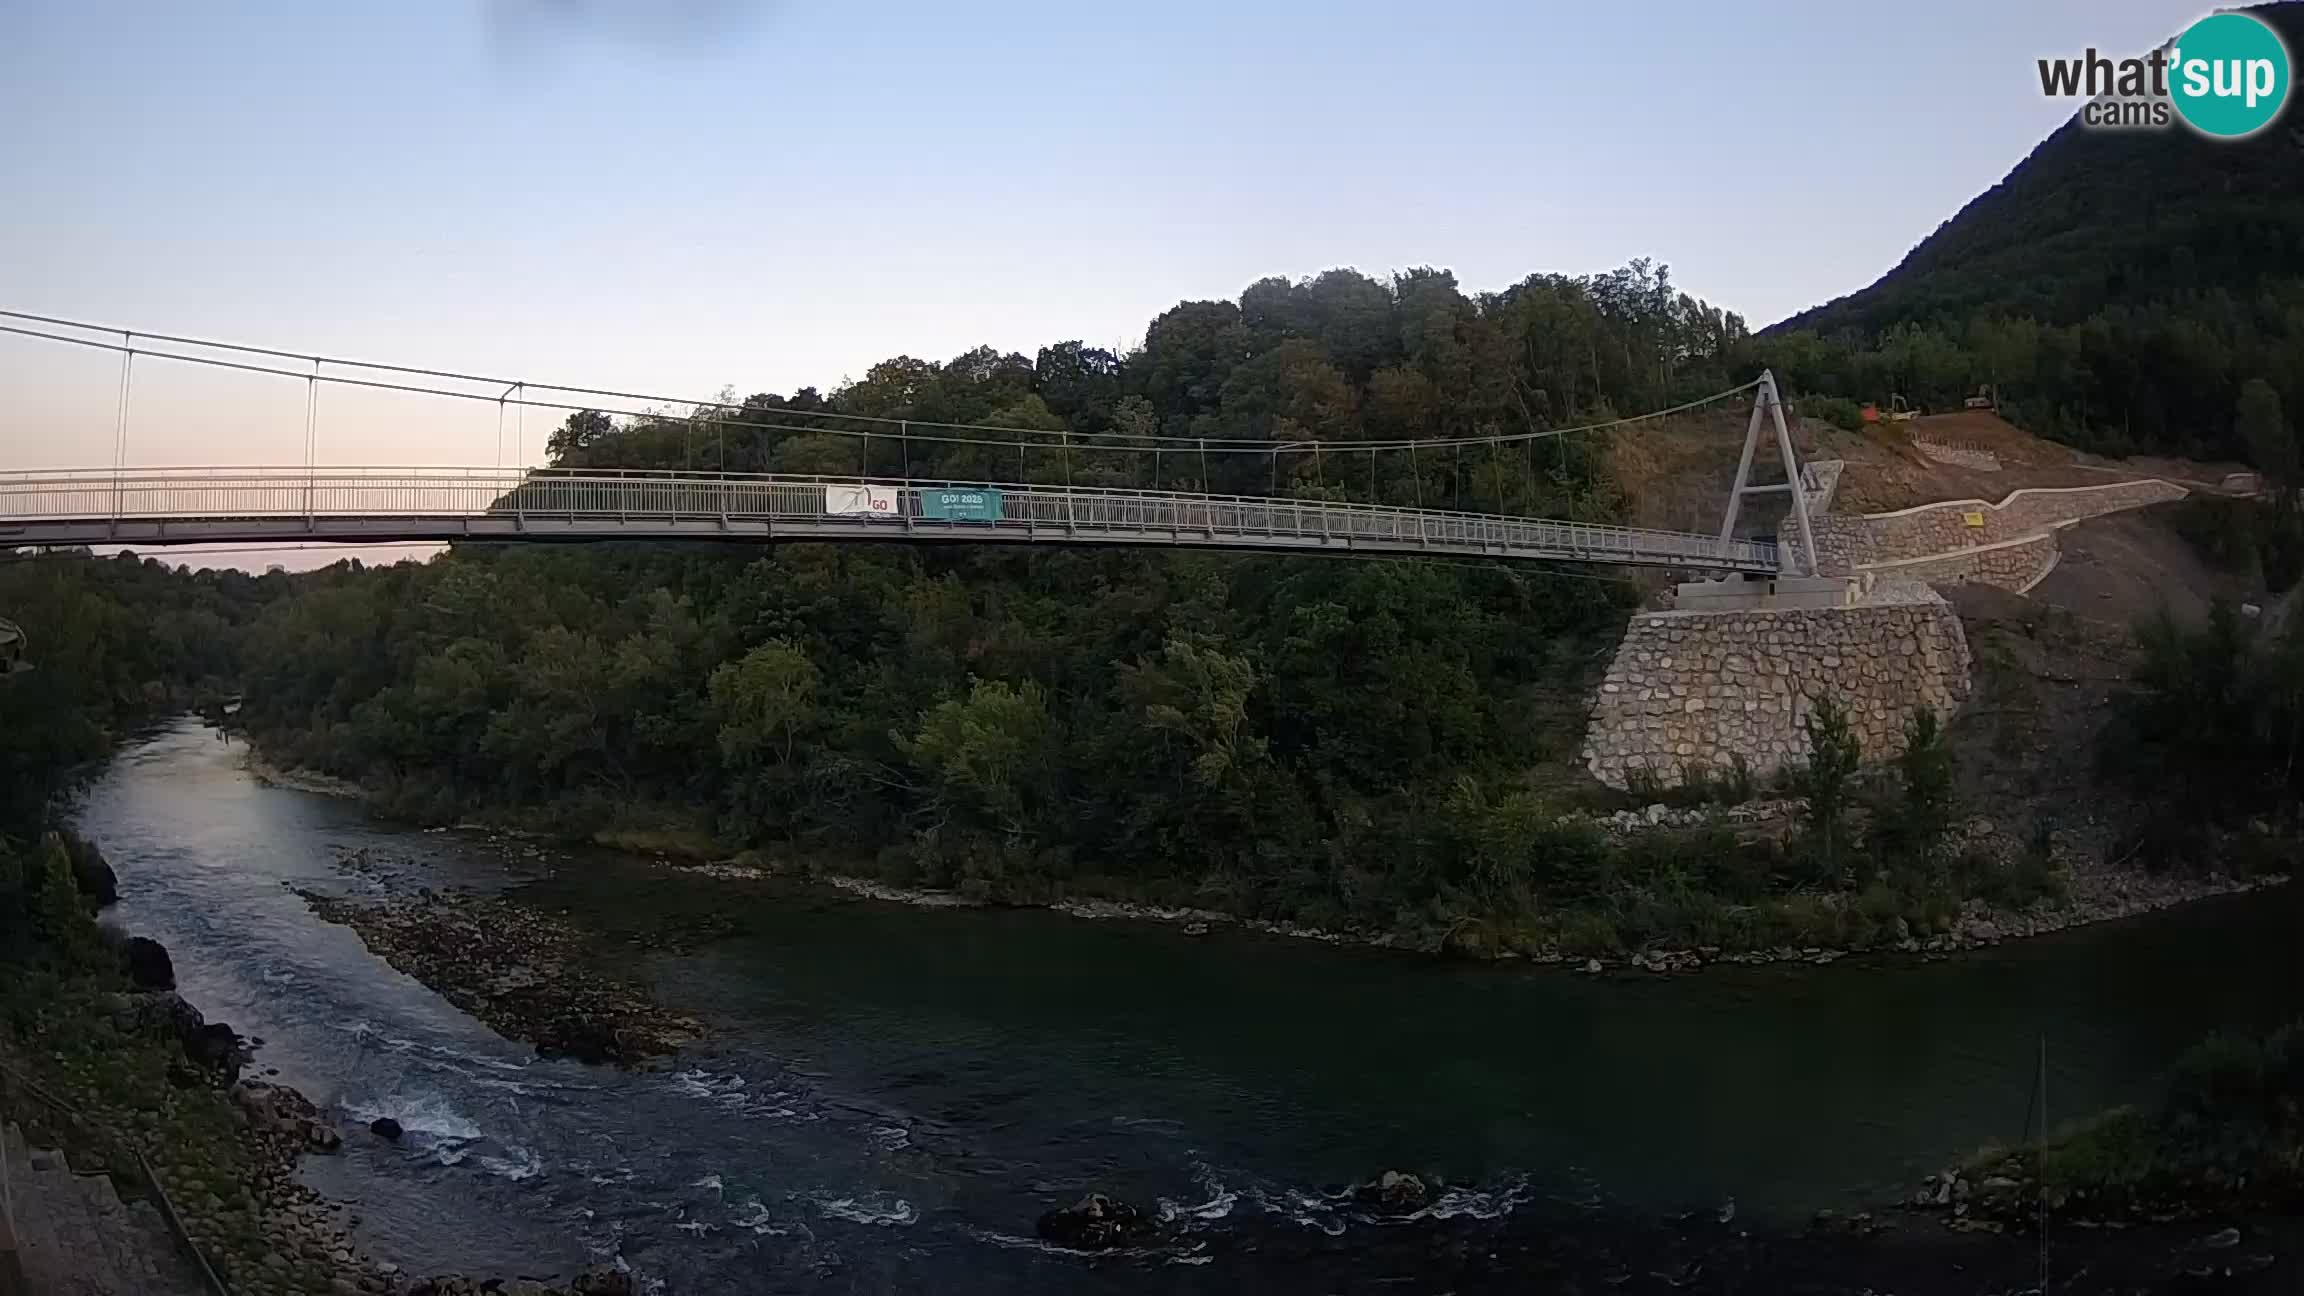 Fußgängerbrücke auf der Soča fluss Webcam Solkan